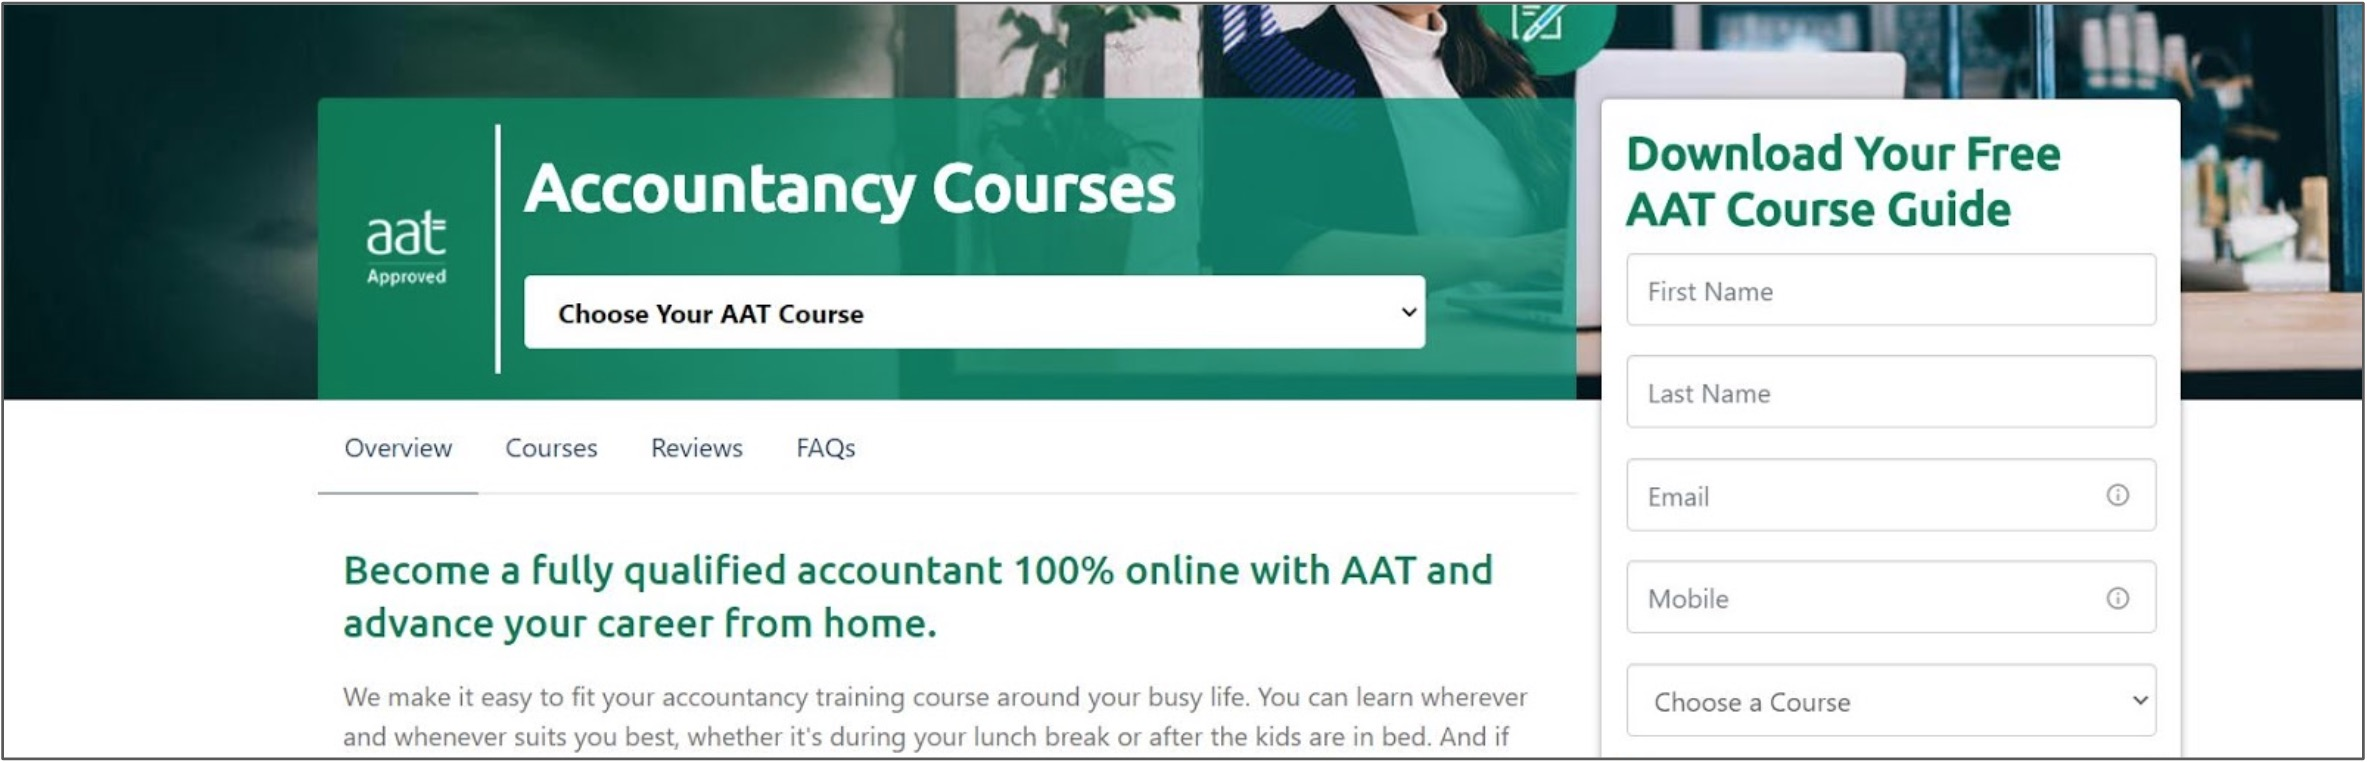 Screenshot of Accountancy courses on ICS Learn